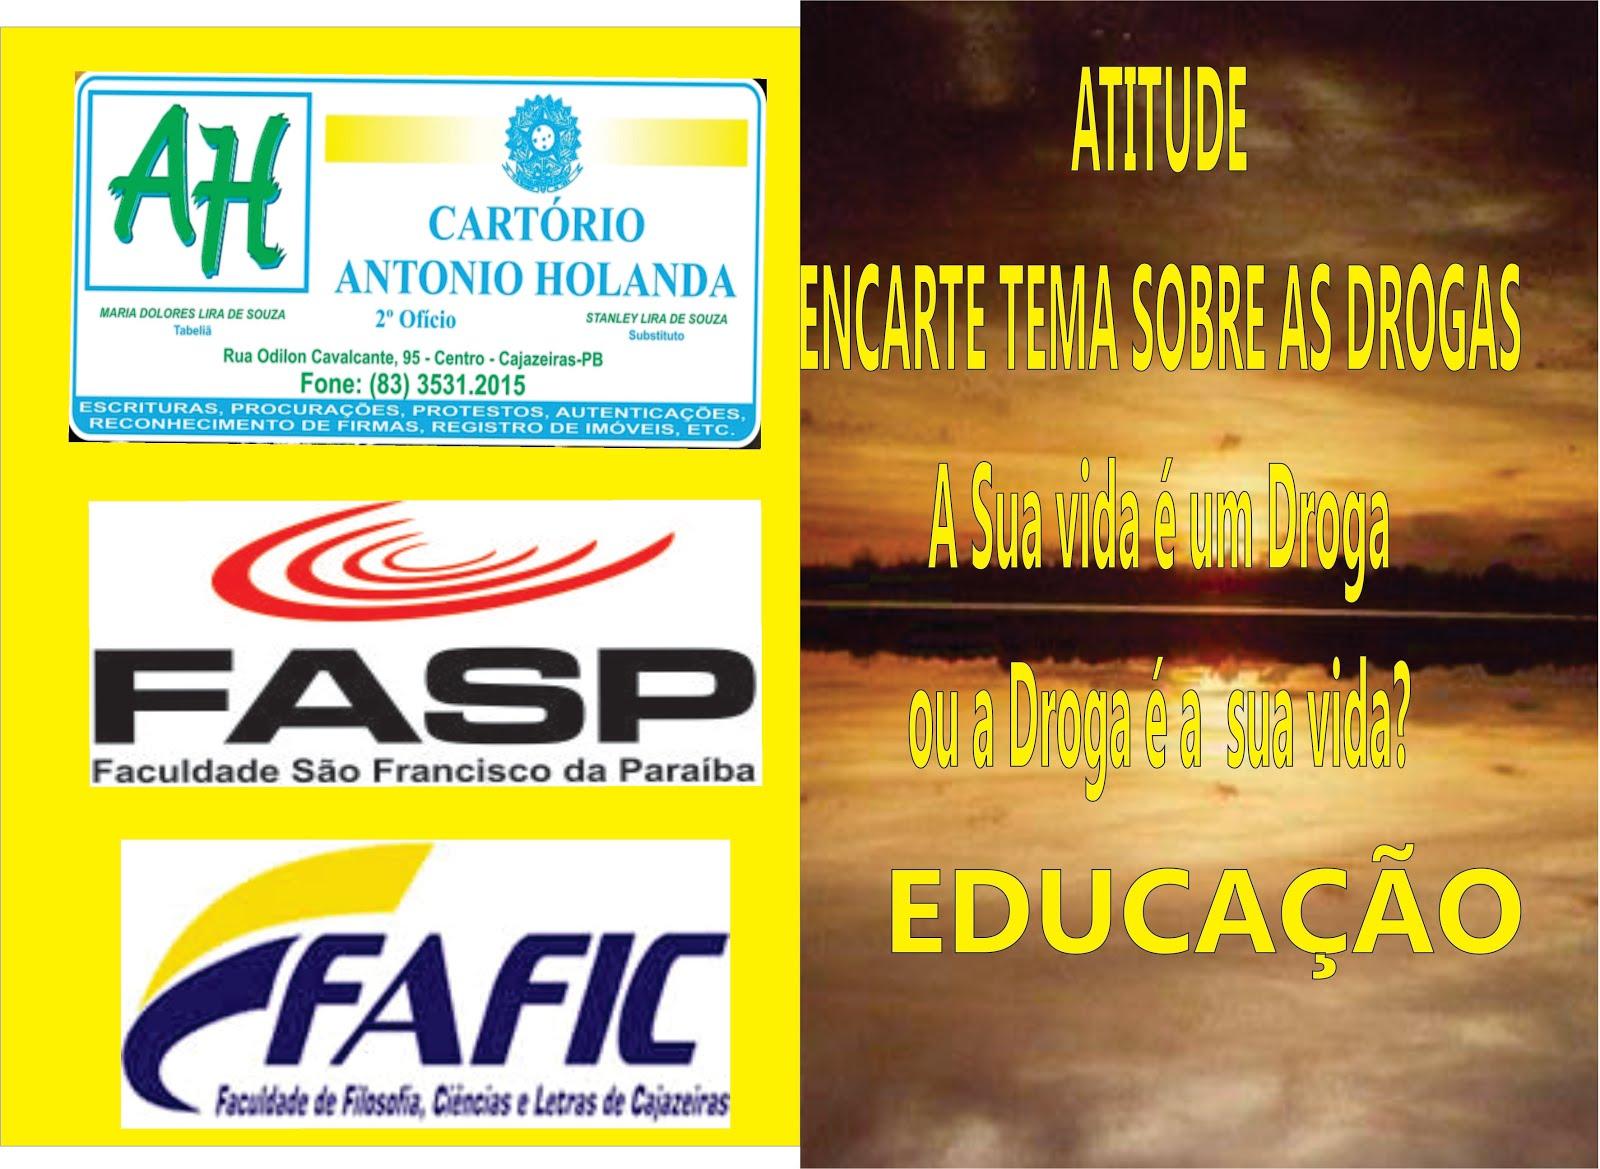 CAPA  DA  REVISTA SUPLEMENTAR  NO TEMA  DROGAS